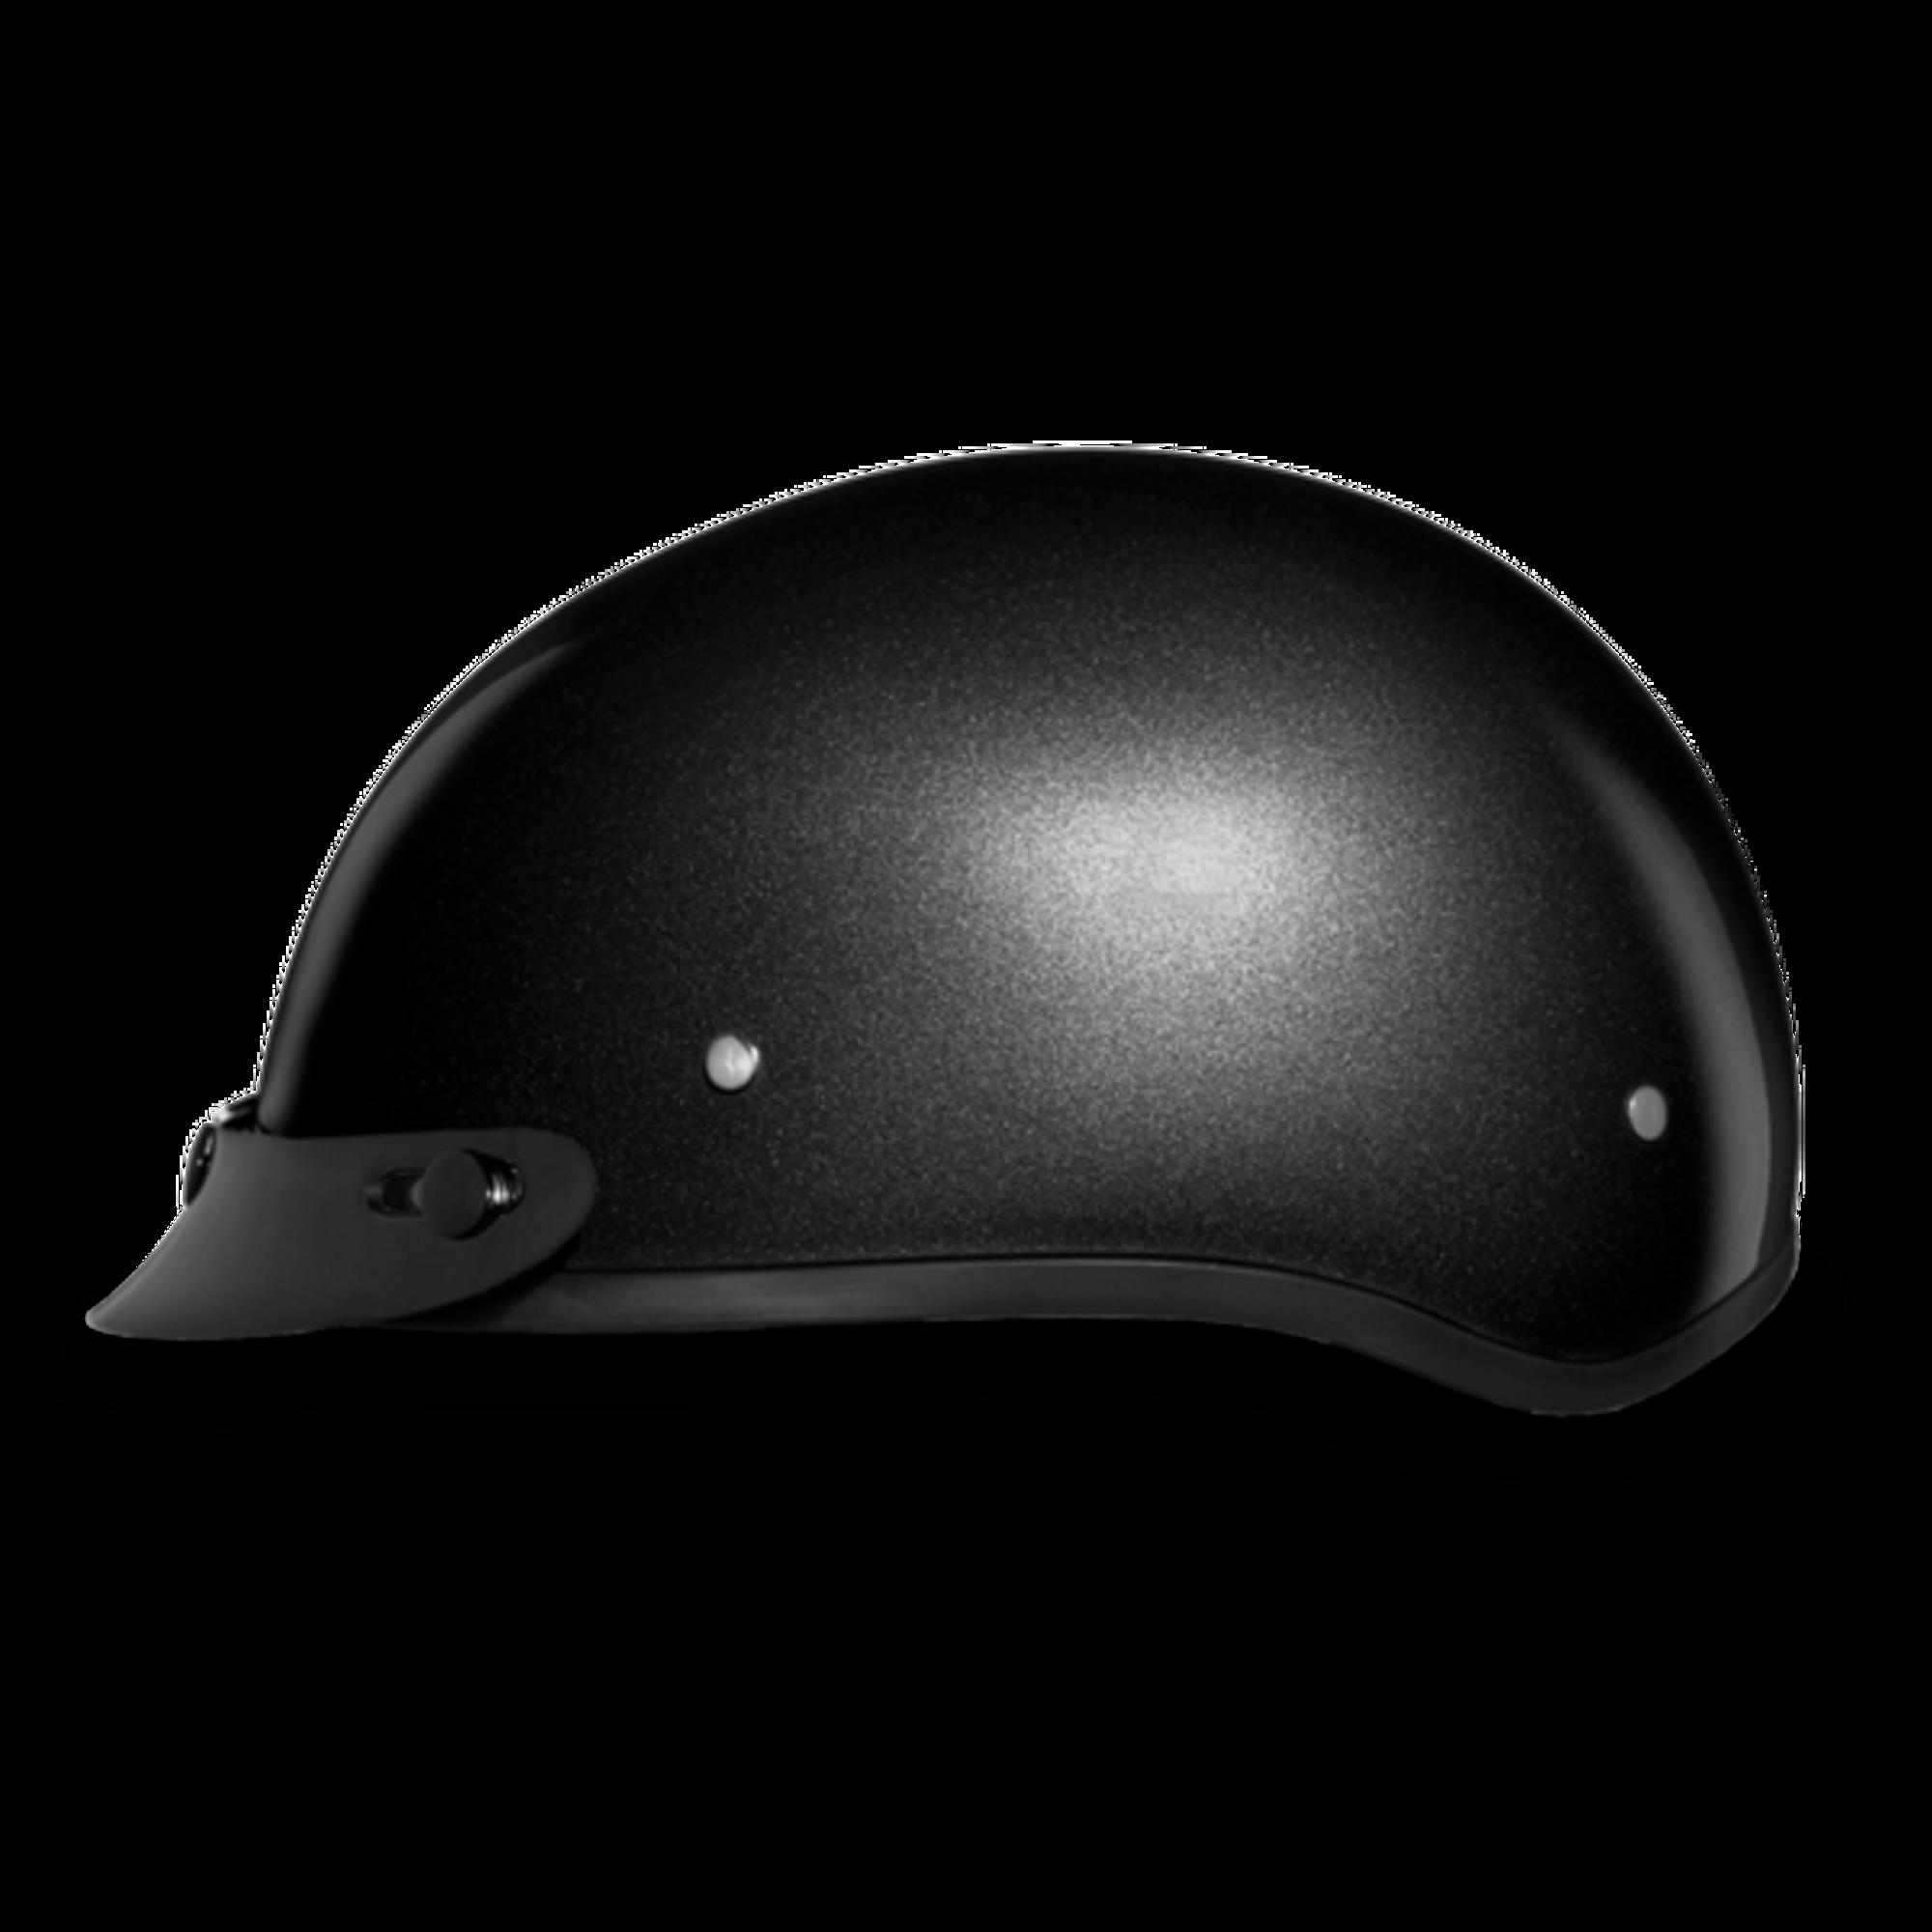 D.O.T. DAYTONA SKULL CAP- GUN METAL GREY METALLIC - Novelty Helmet Shop 17e4bcf7a2b